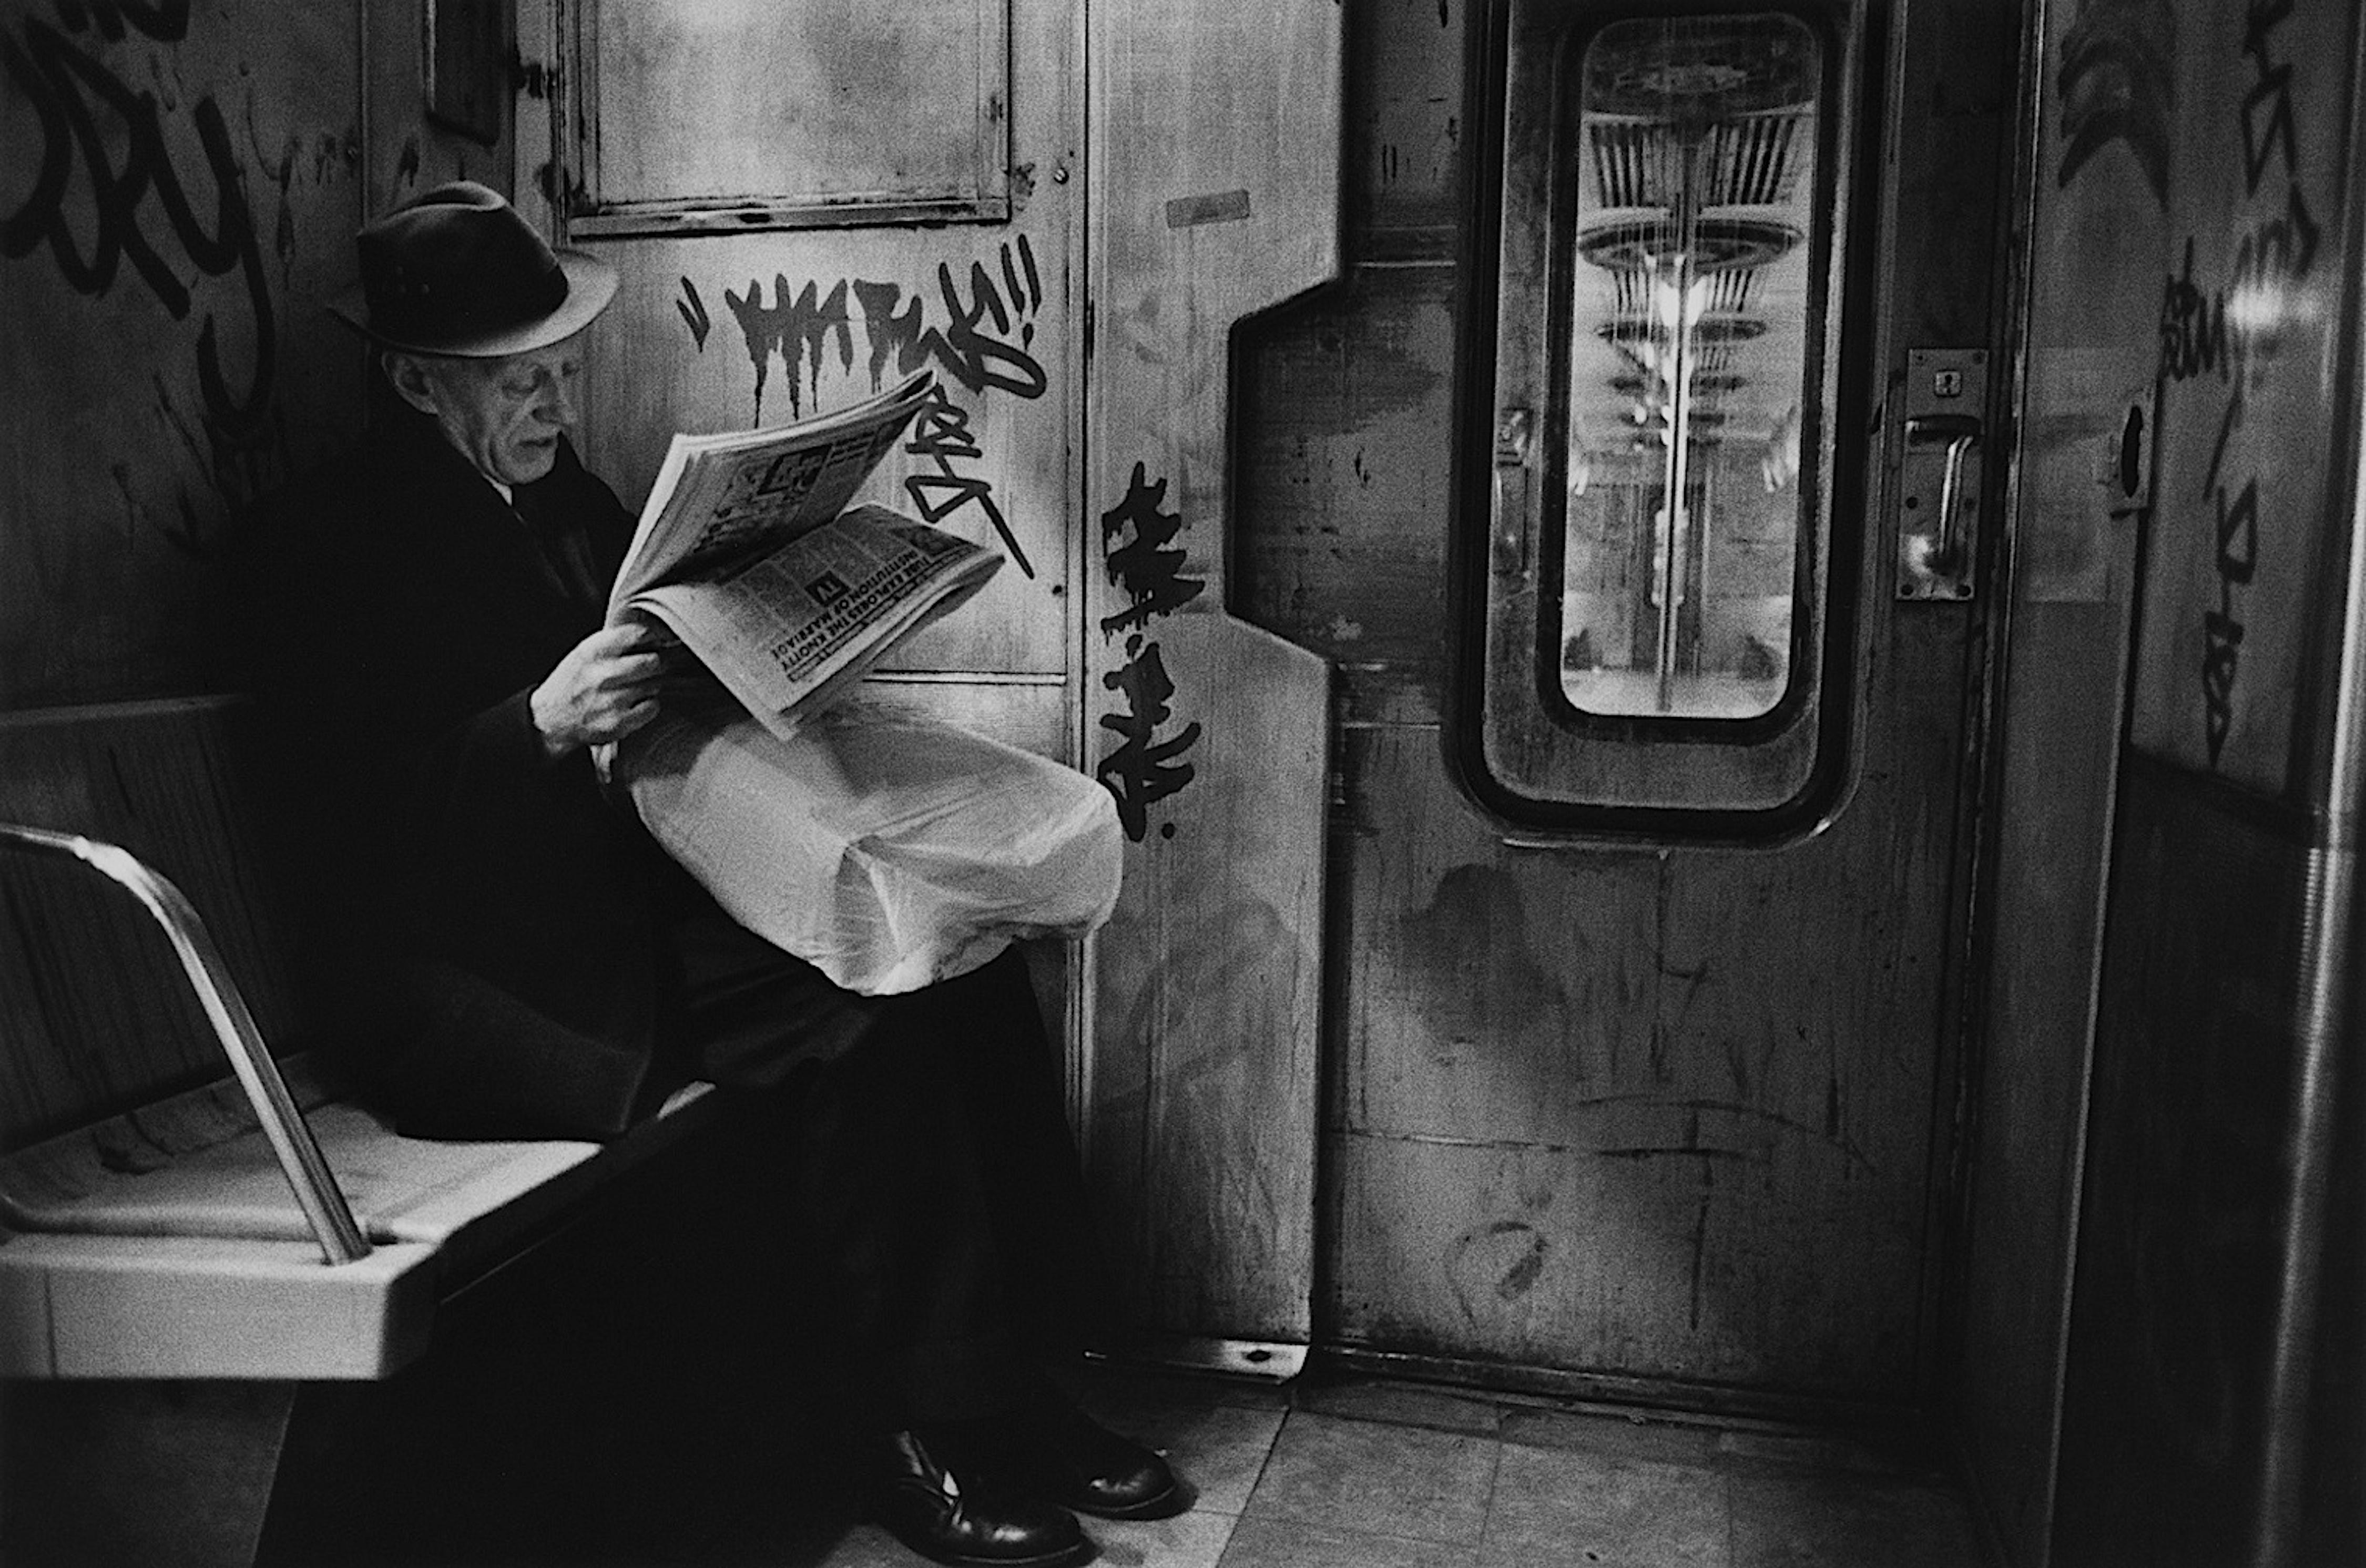 Subway noir, 1987 Richard Sandler Photography